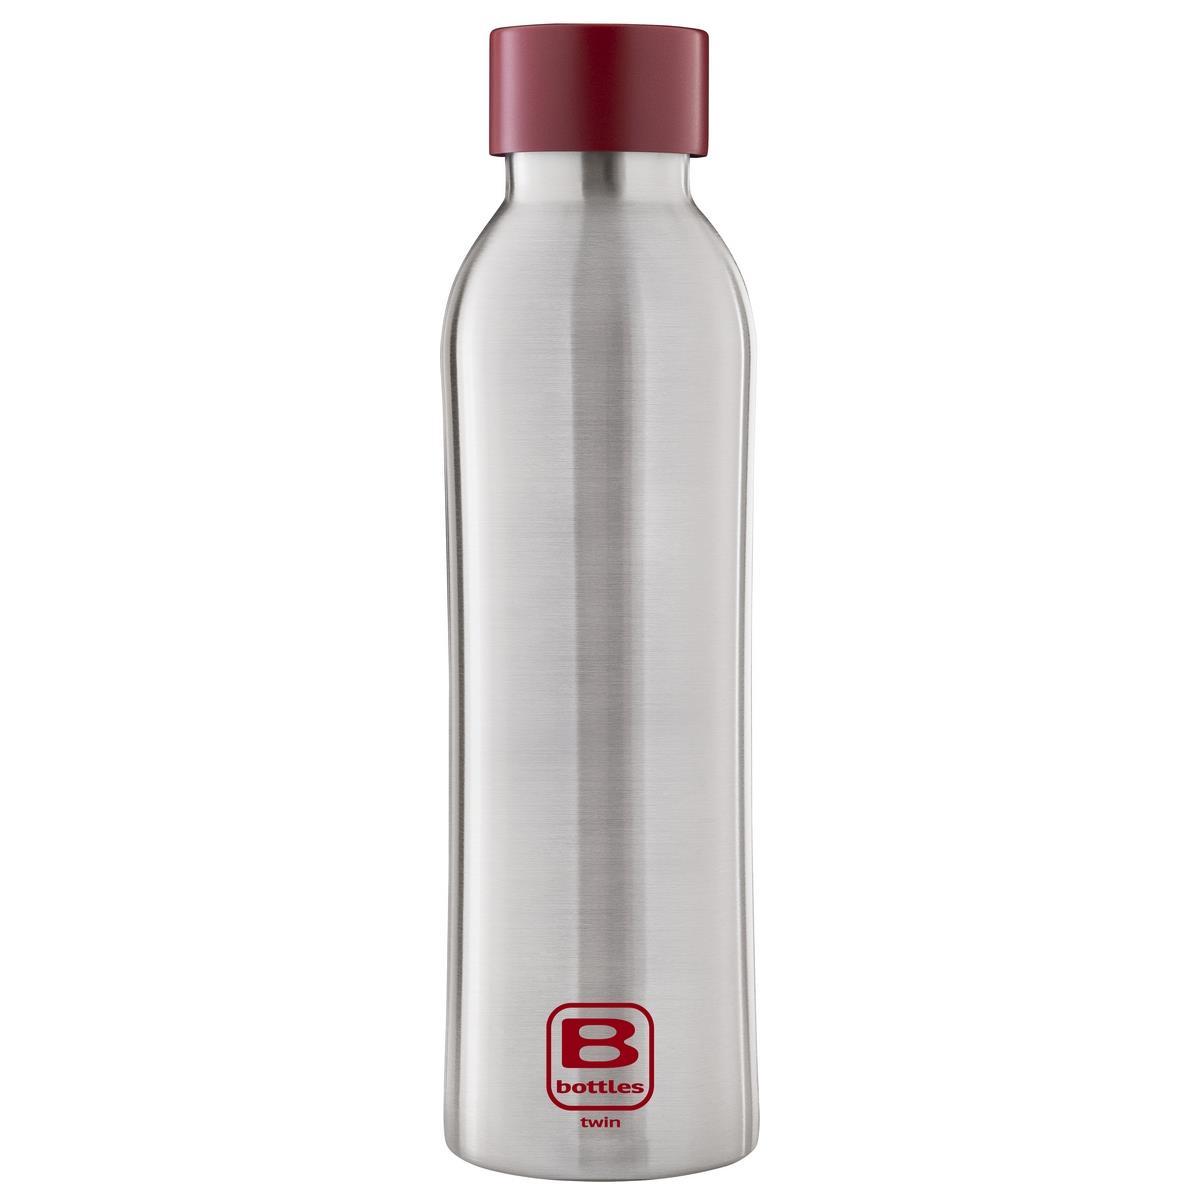 B Bottles Twin - Steel & Red - 500 ml - Bottiglia Termica a doppia parete in acciaio inox 18/10